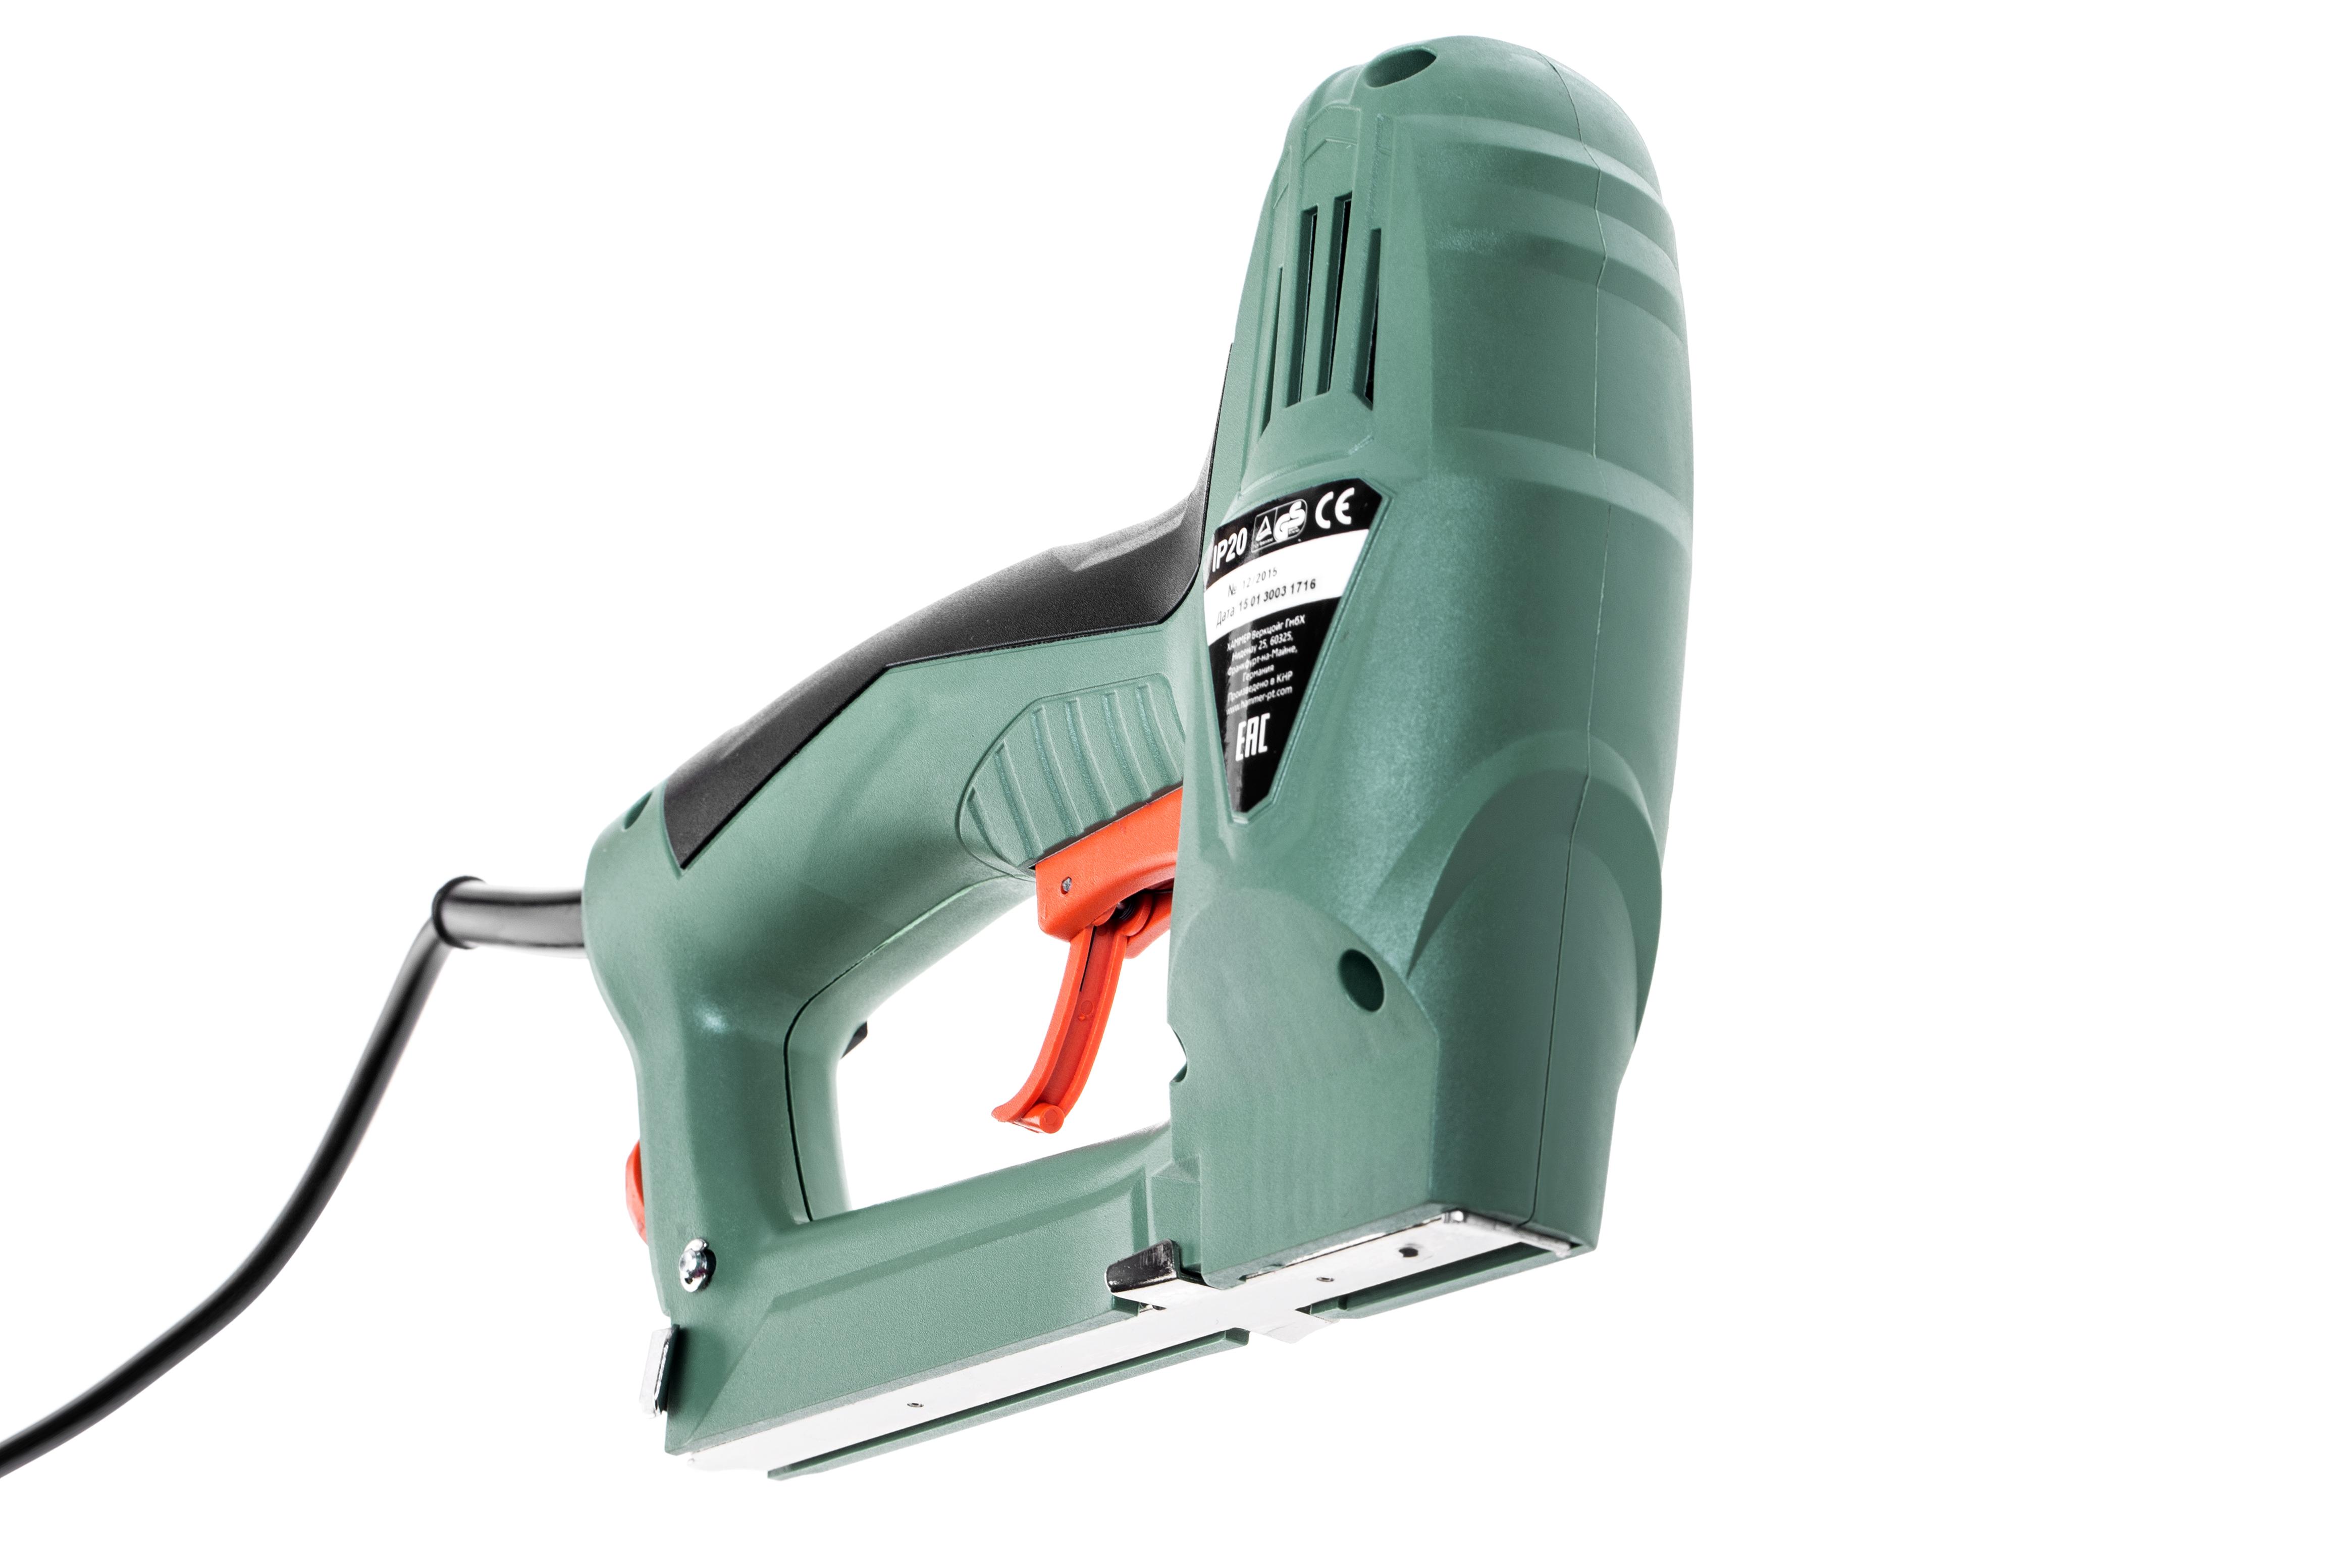 Электрический степлер Hammer Hpe10 электрический от 220 Вольт